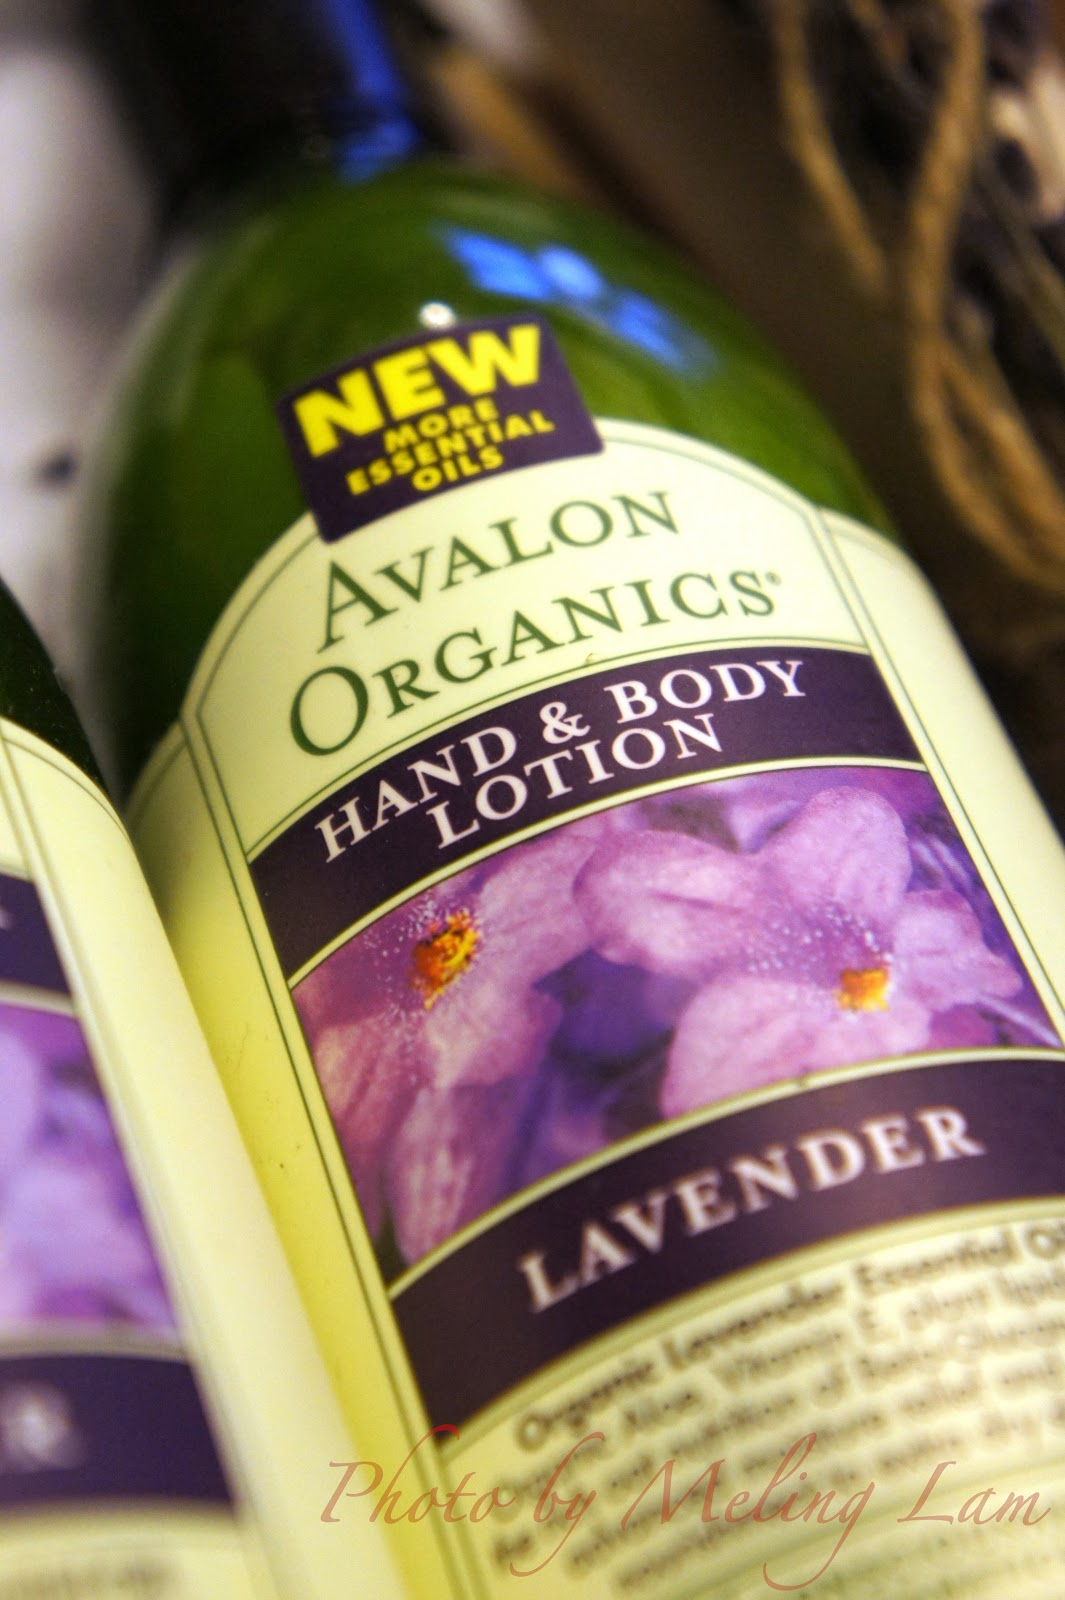 avalon organics hand body lotion organic lavender